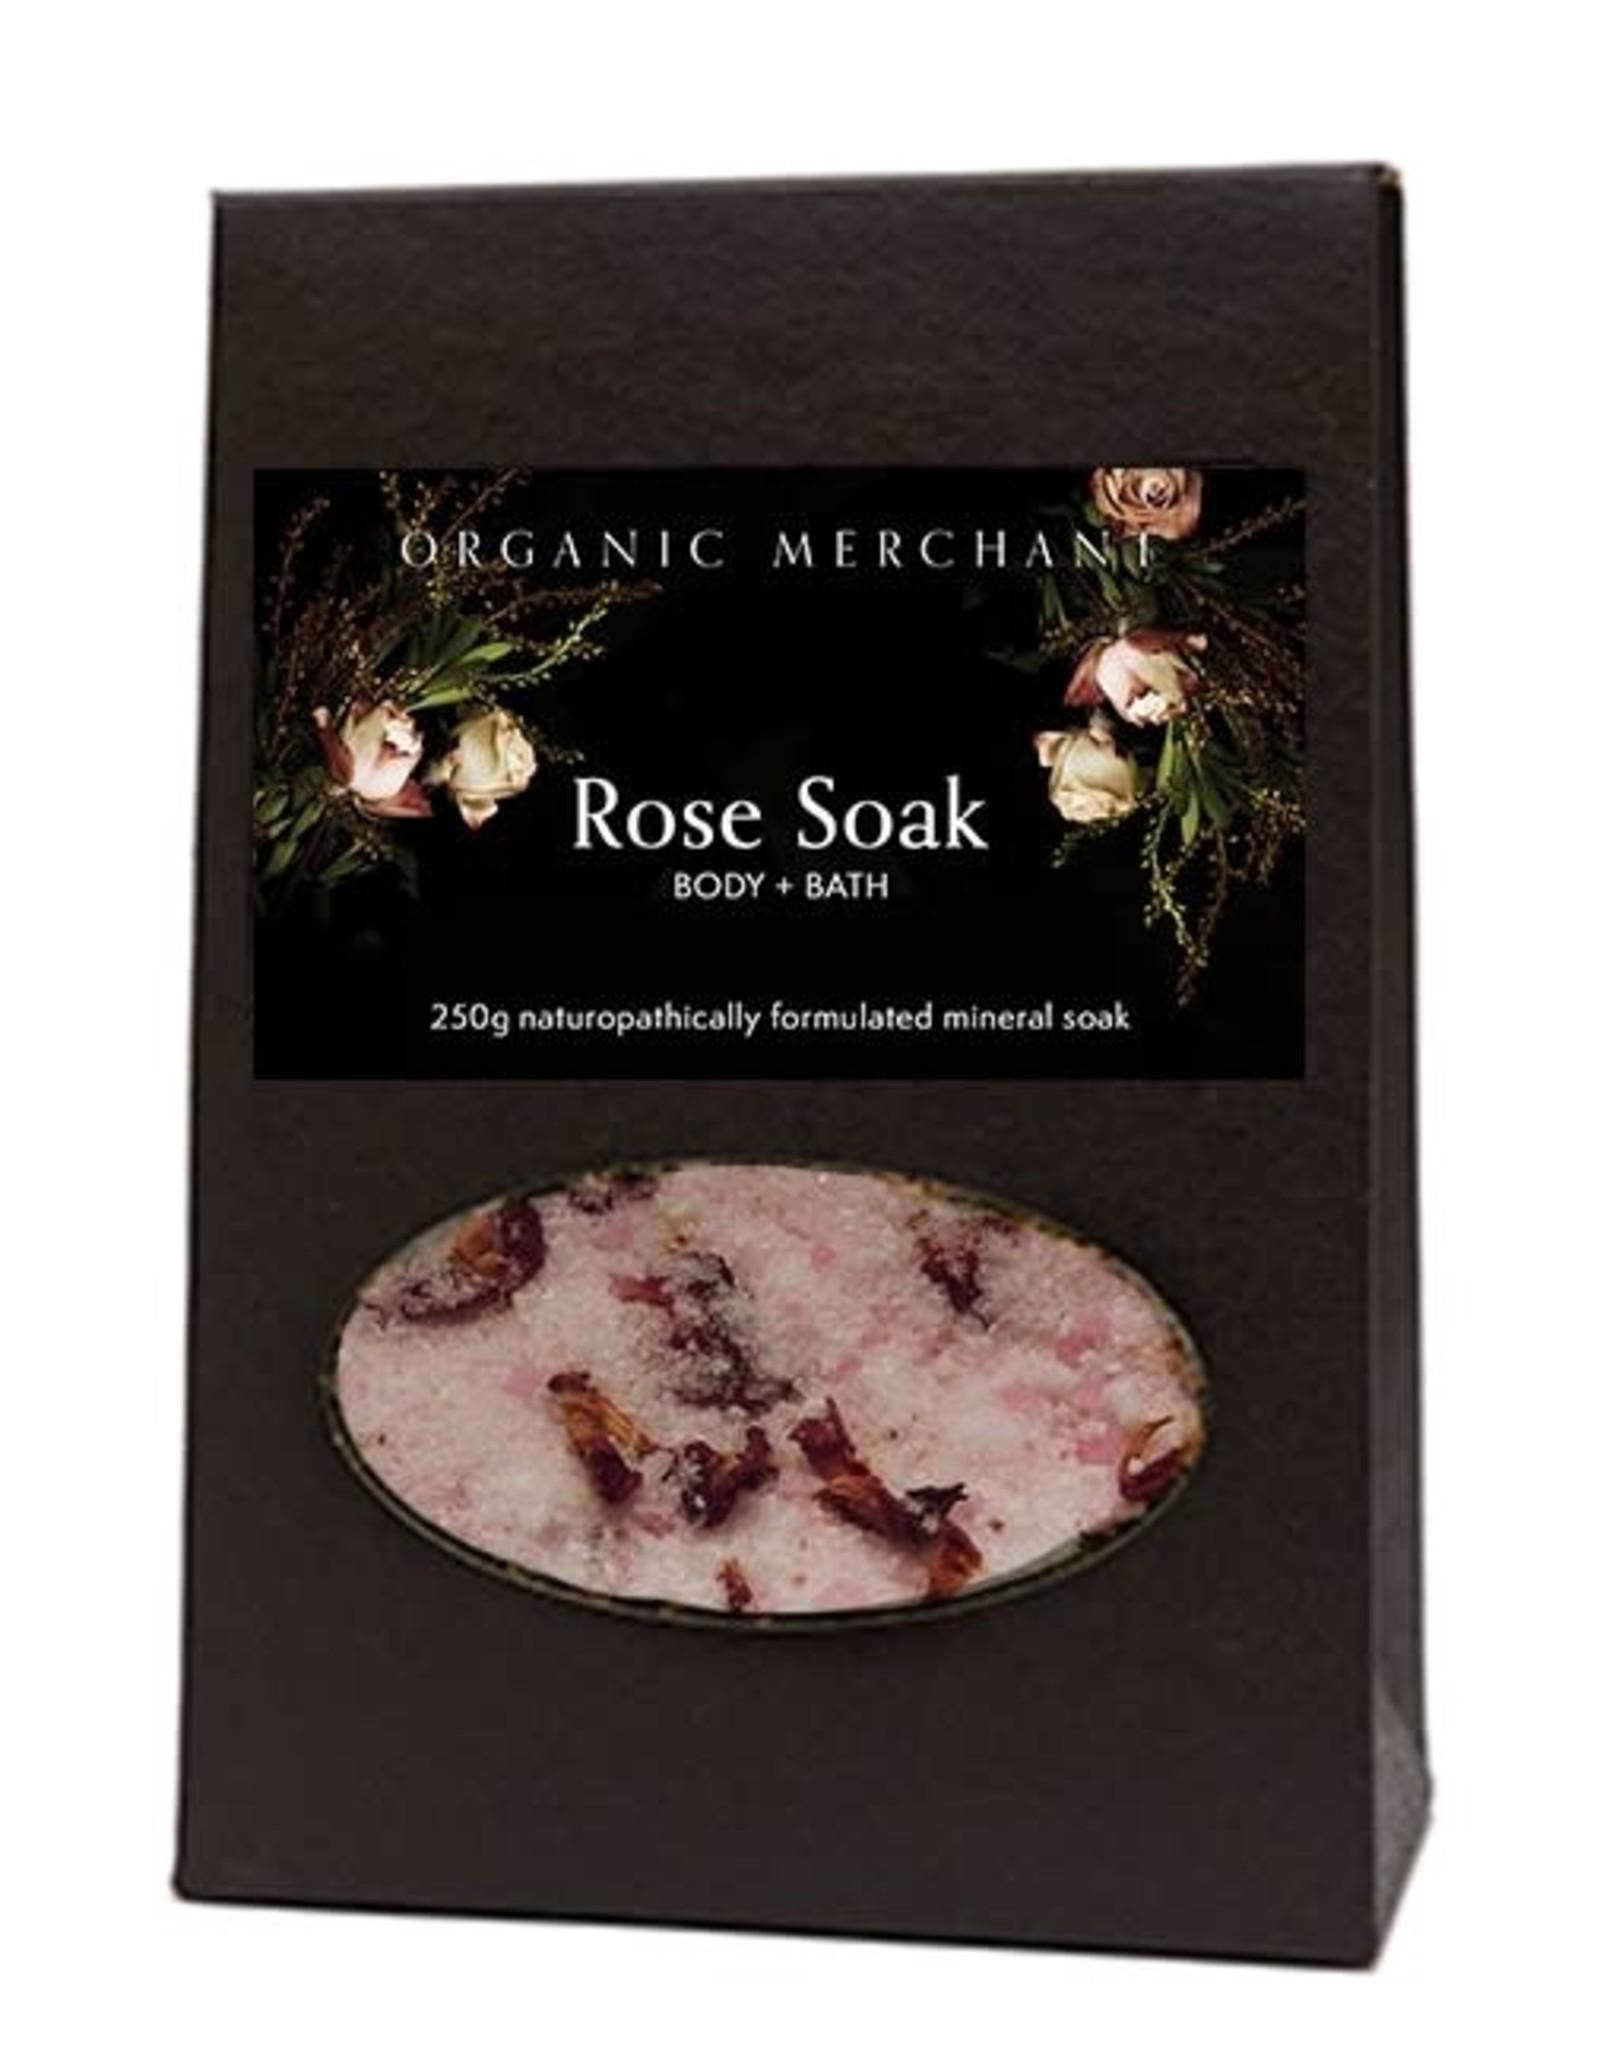 Organic Merchant Rose Body & Bath Soak